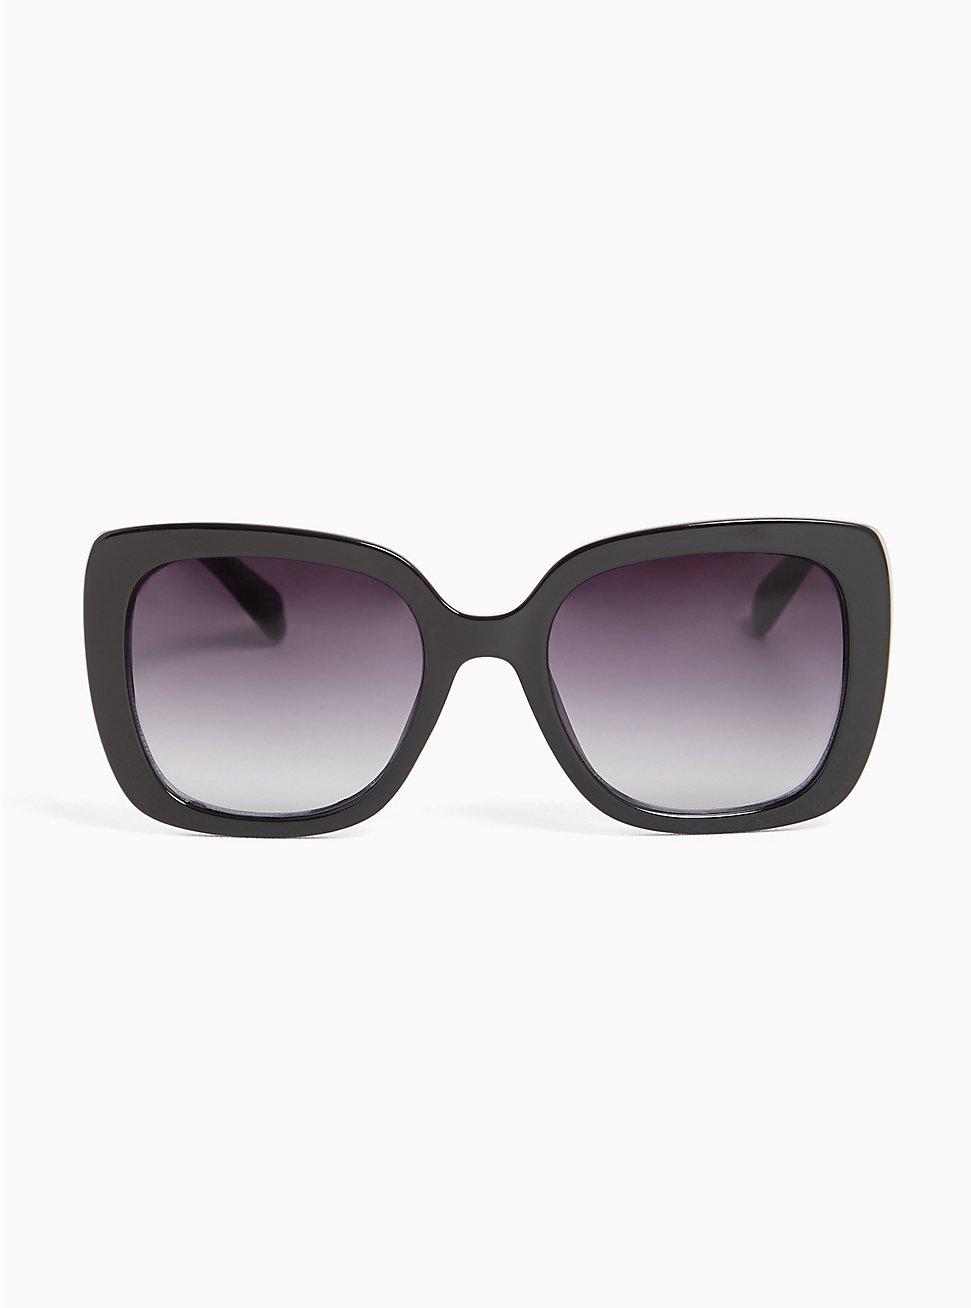 Black Rectangle & Silver-Tone Temple Sunglasses, , hi-res